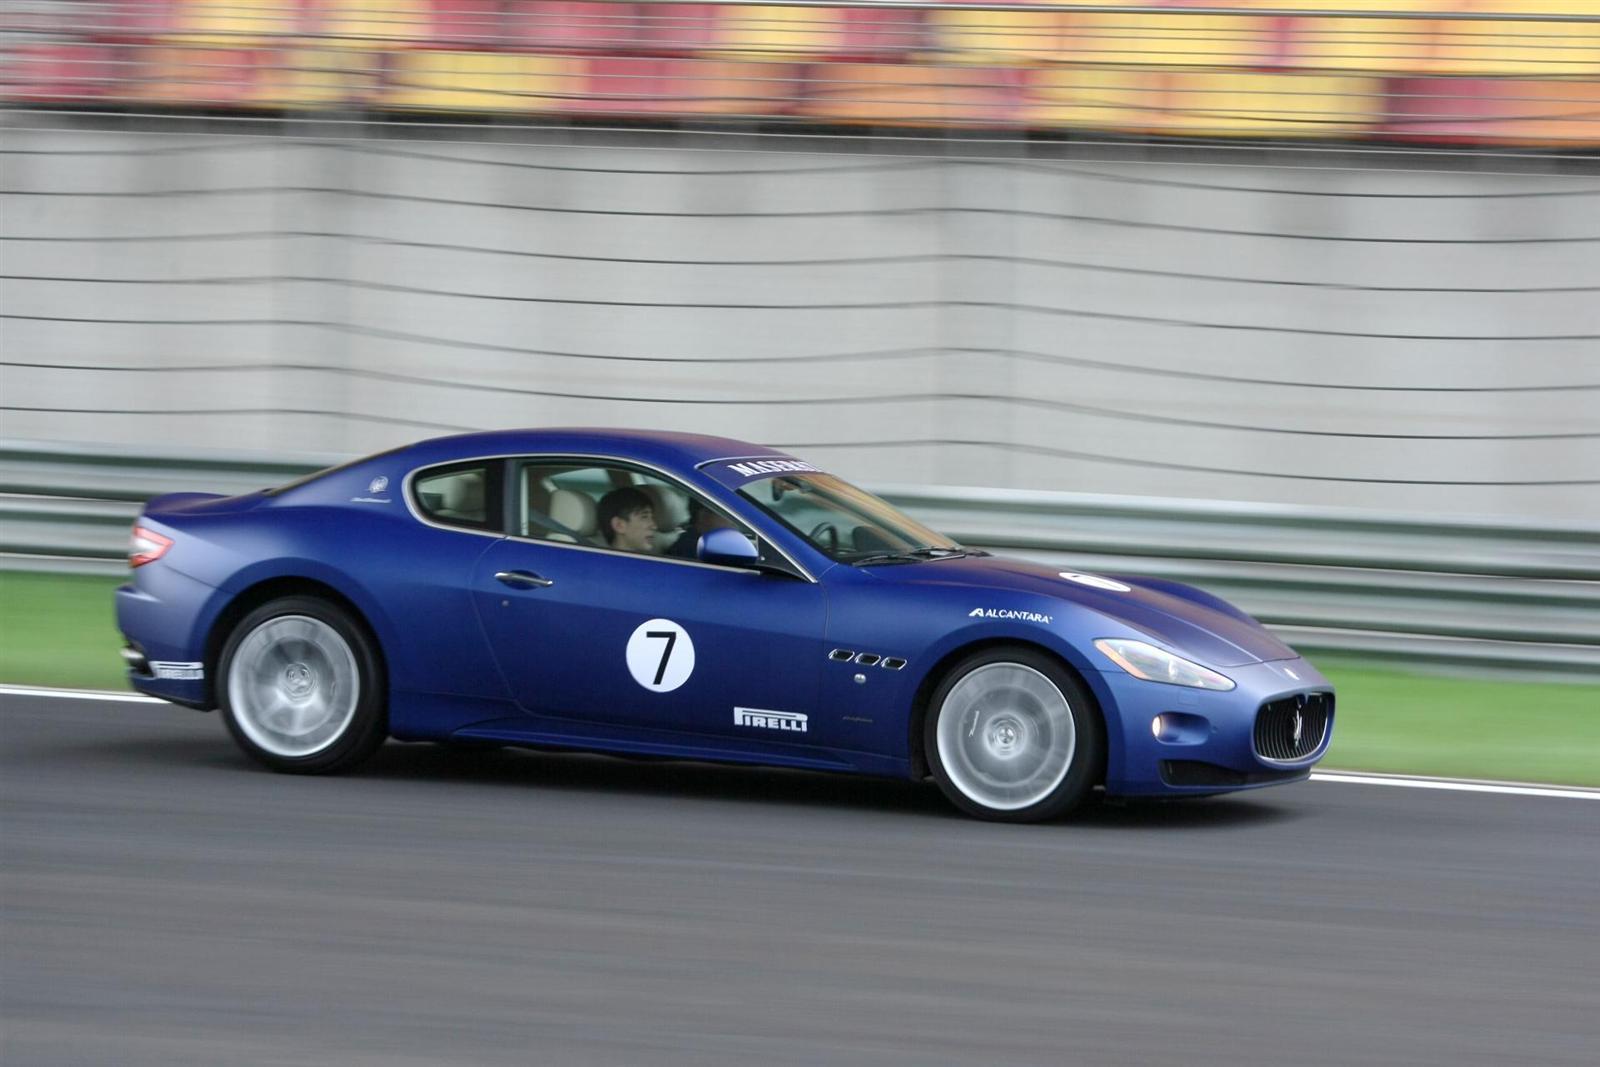 2011 Maserati GranTurismo MC Stradale Image